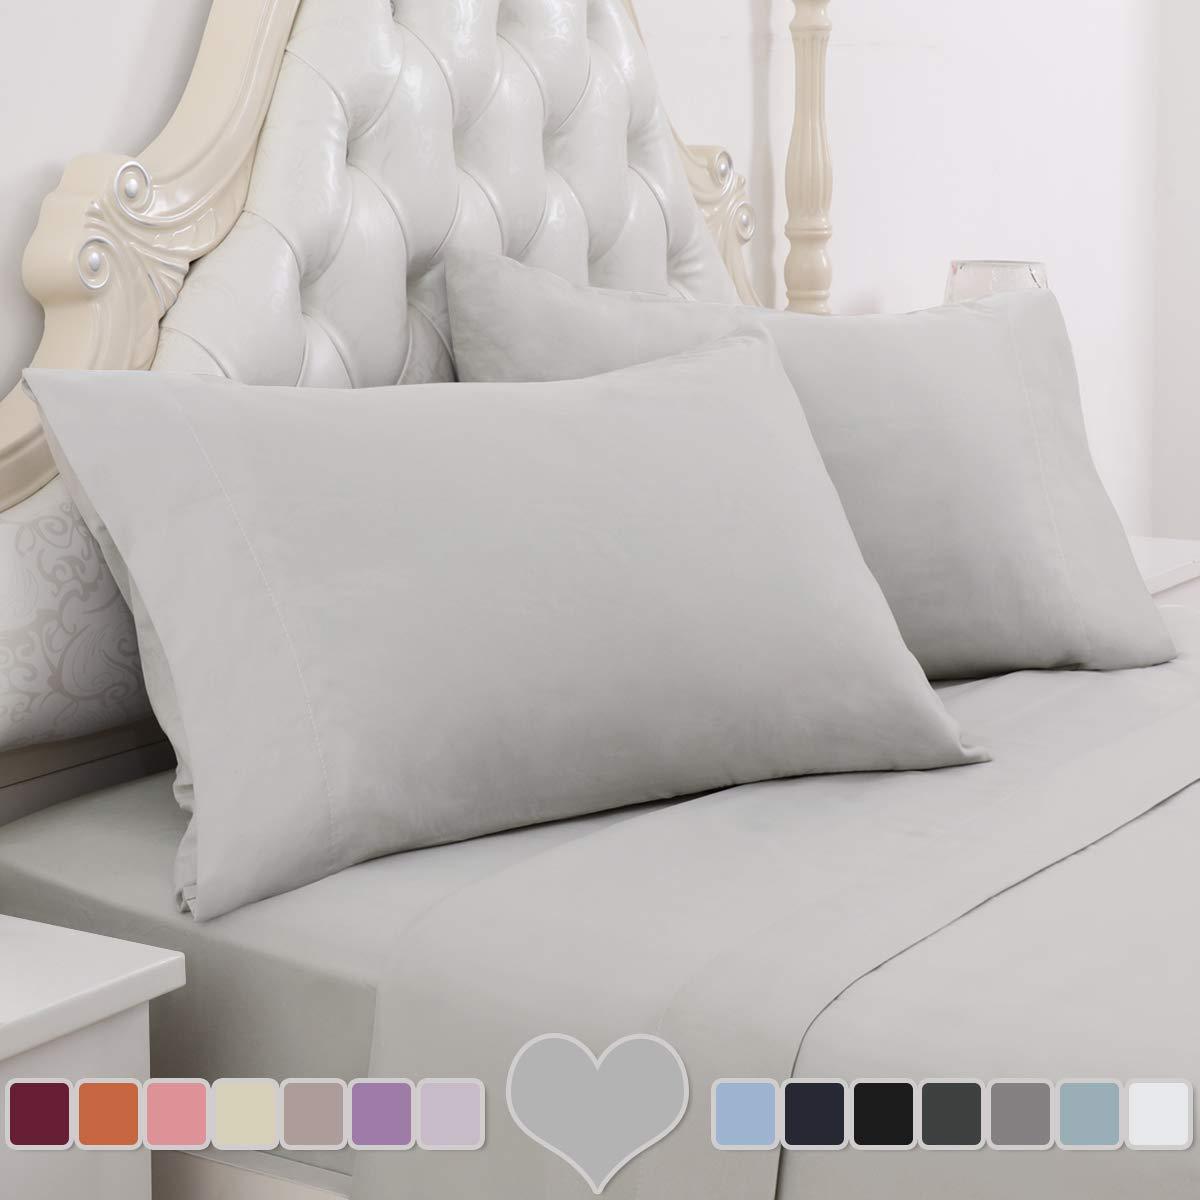 HOMEIDEAS 4 Piece Bed Sheet Set (Queen, Light Gray) 100% Brushed Microfiber 1800 Bedding Sheets - Deep Pockets, Wrinkle & Fade Resistant